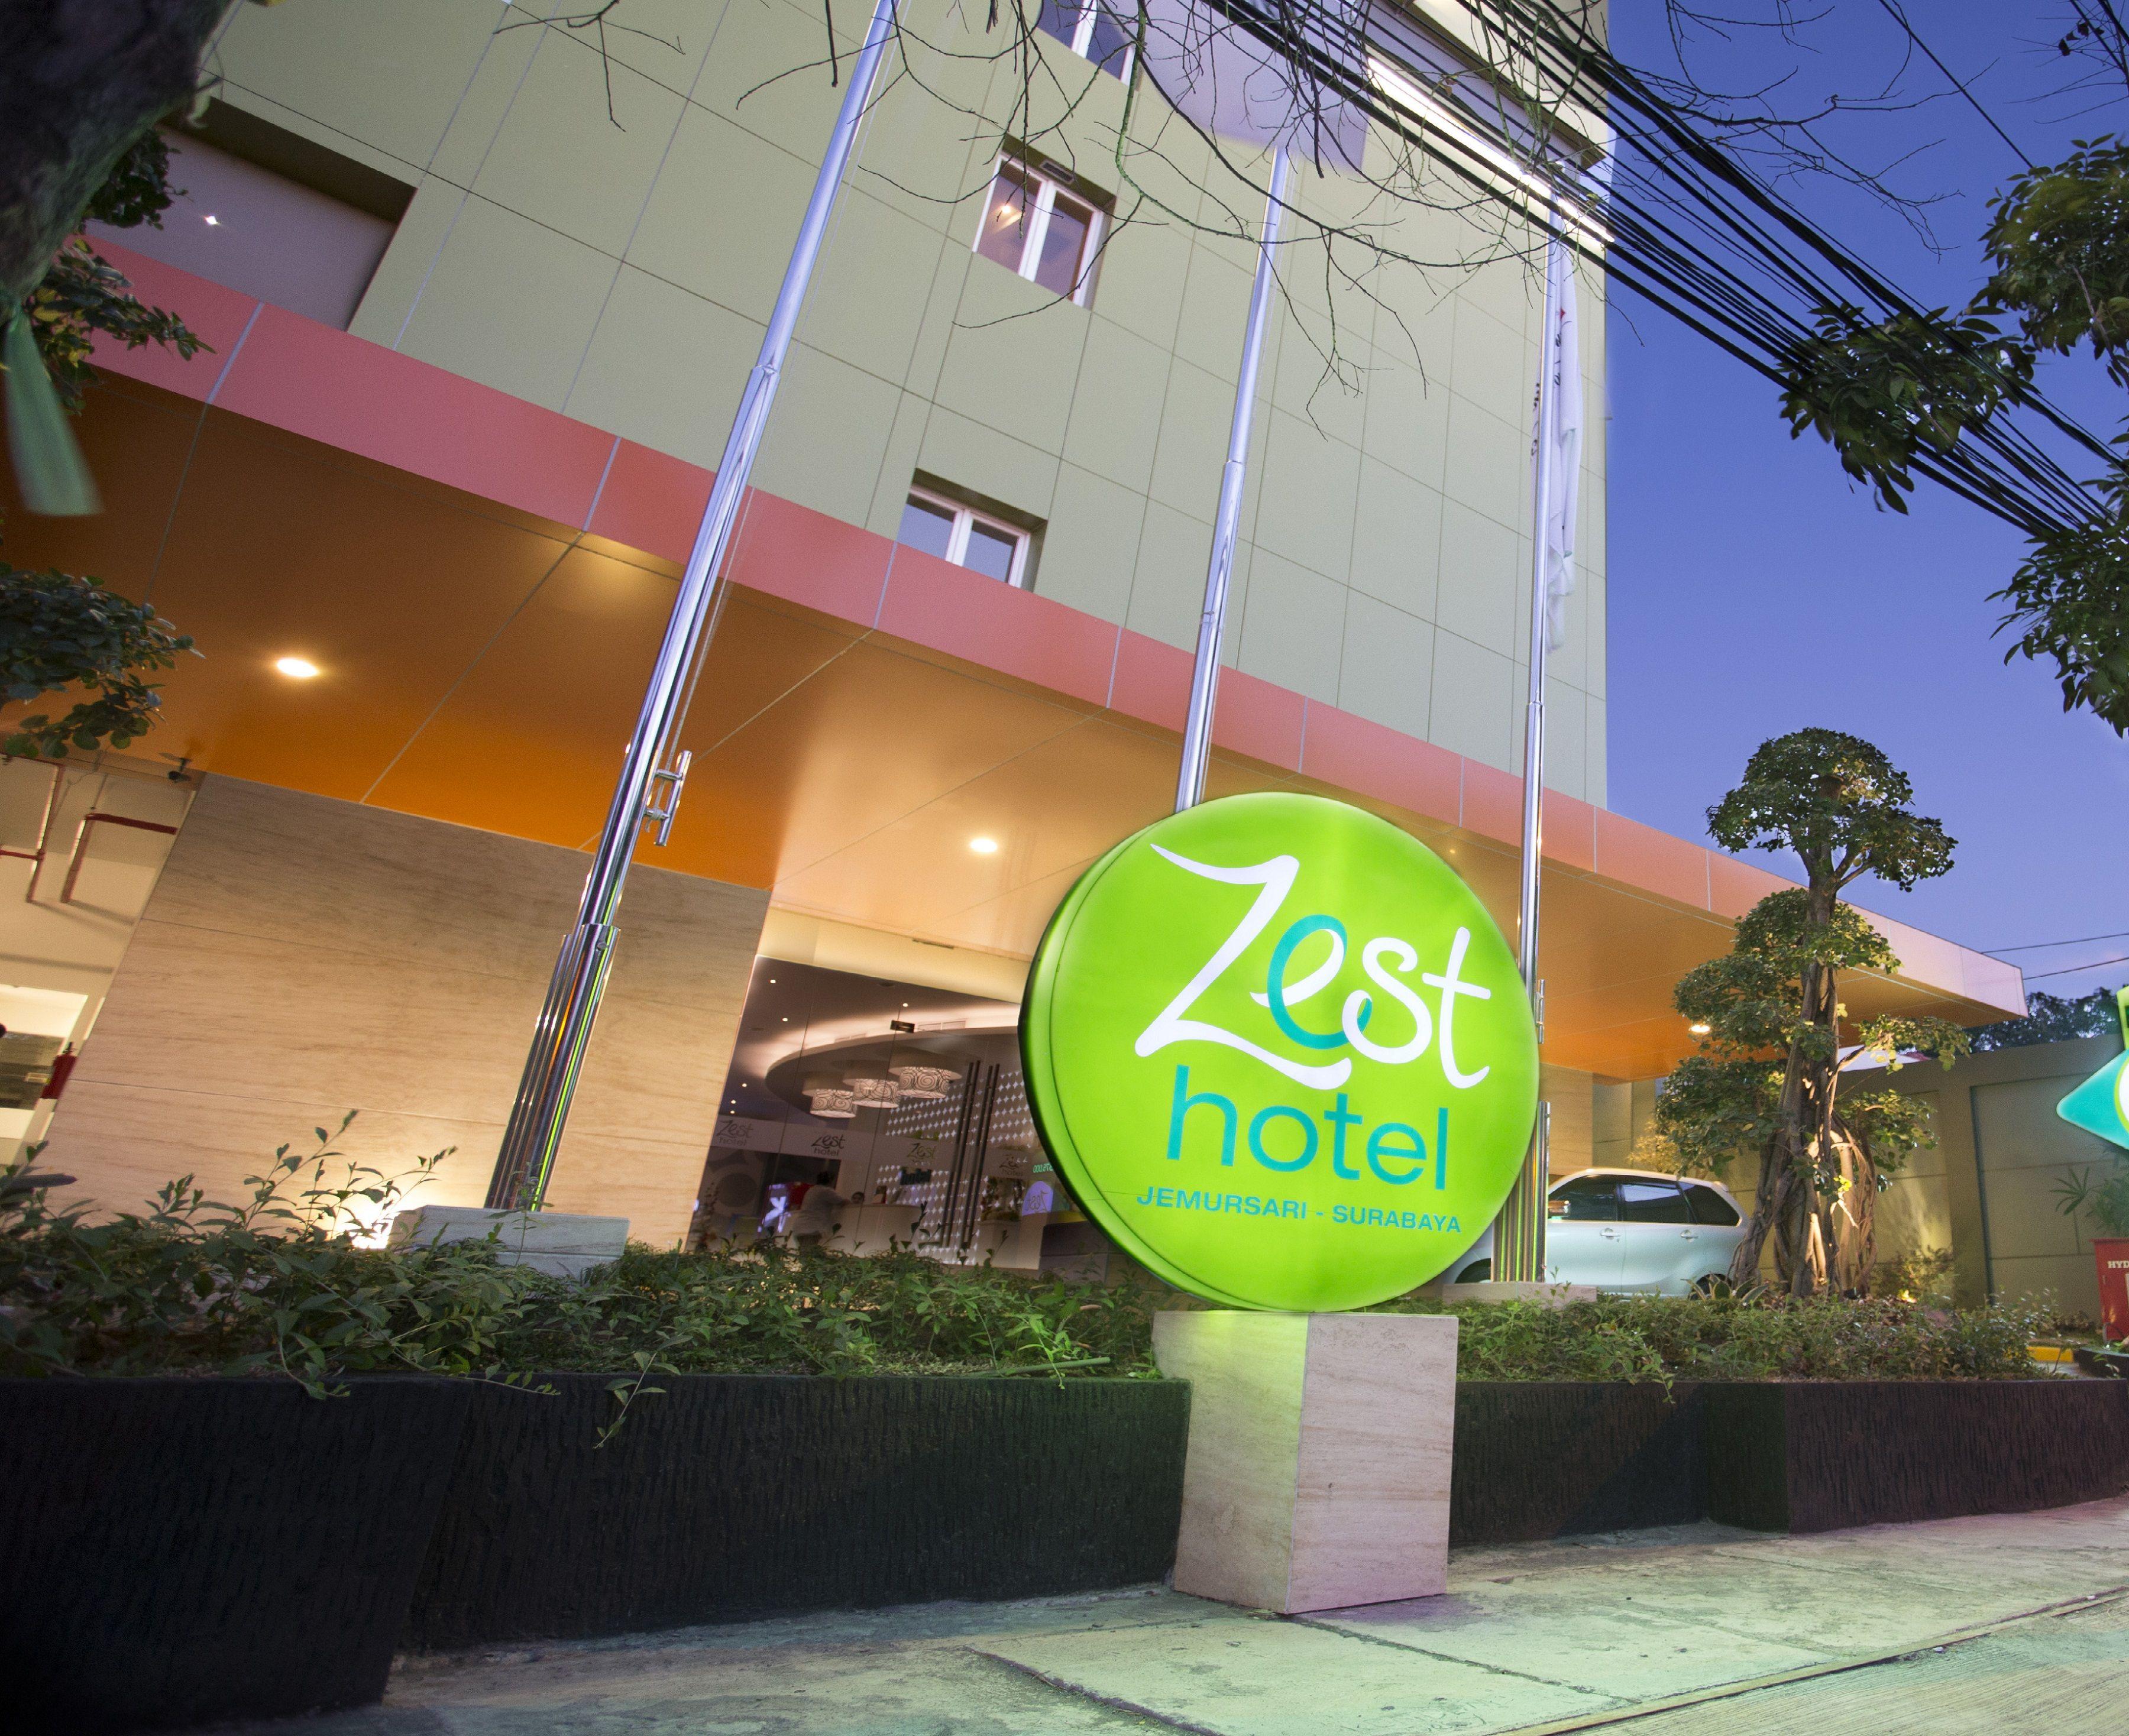 Zest Hotel Jemursari Surabaya, Surabaya